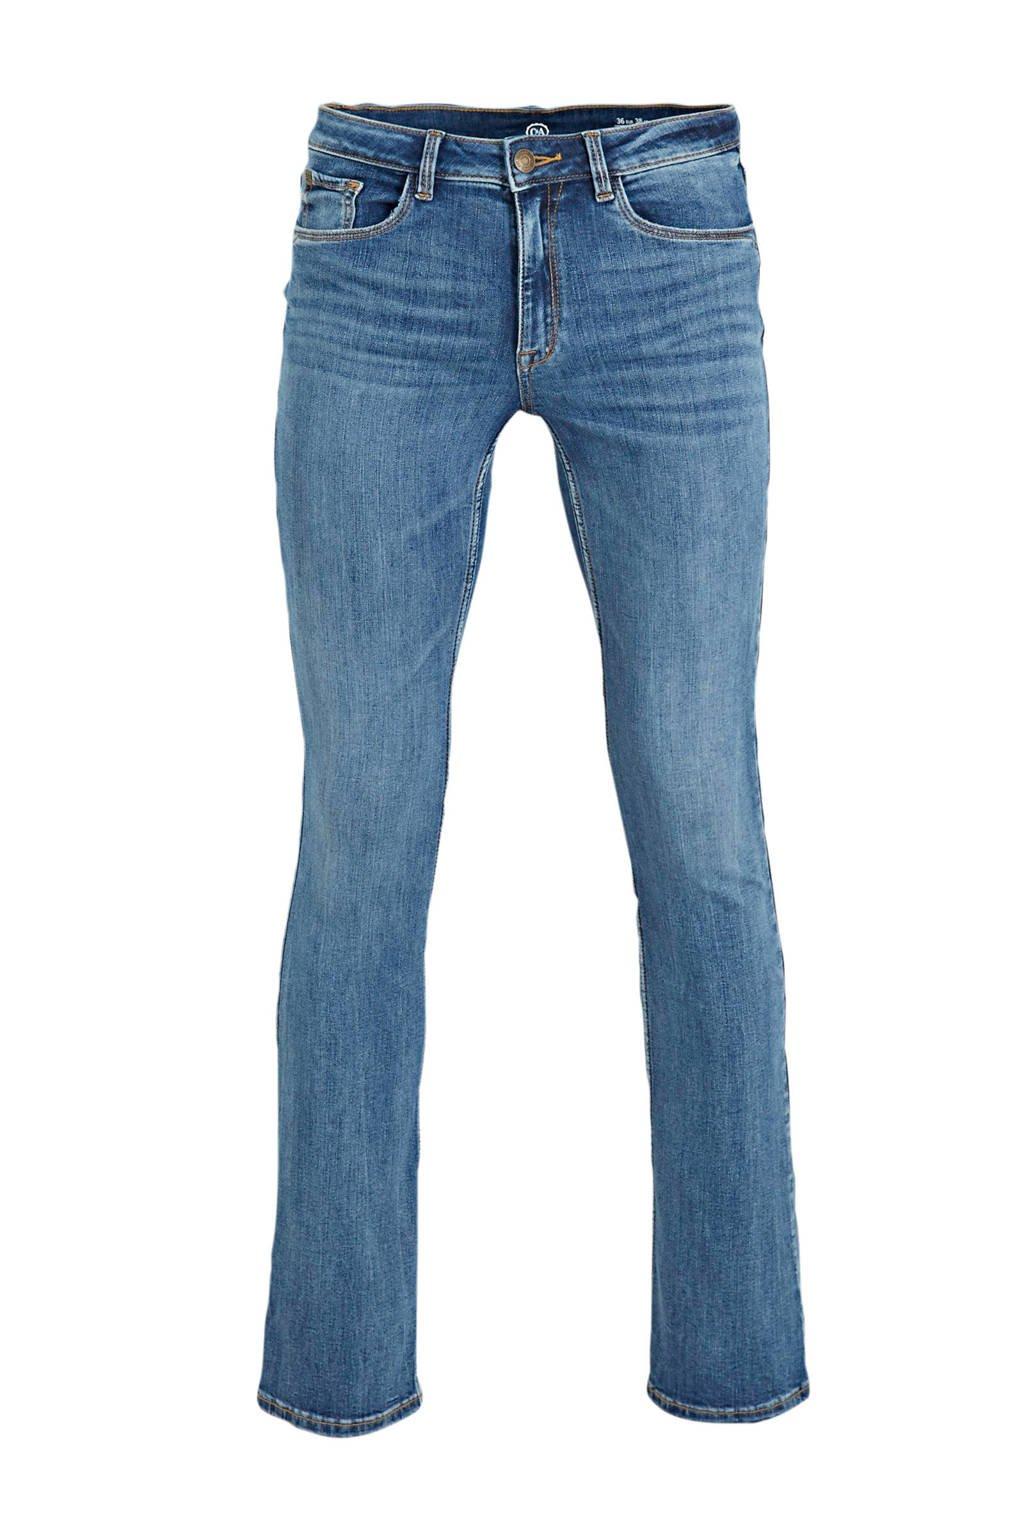 C&A The Denim bootcut jeans light denim stonewashed, Light denim stonewashed